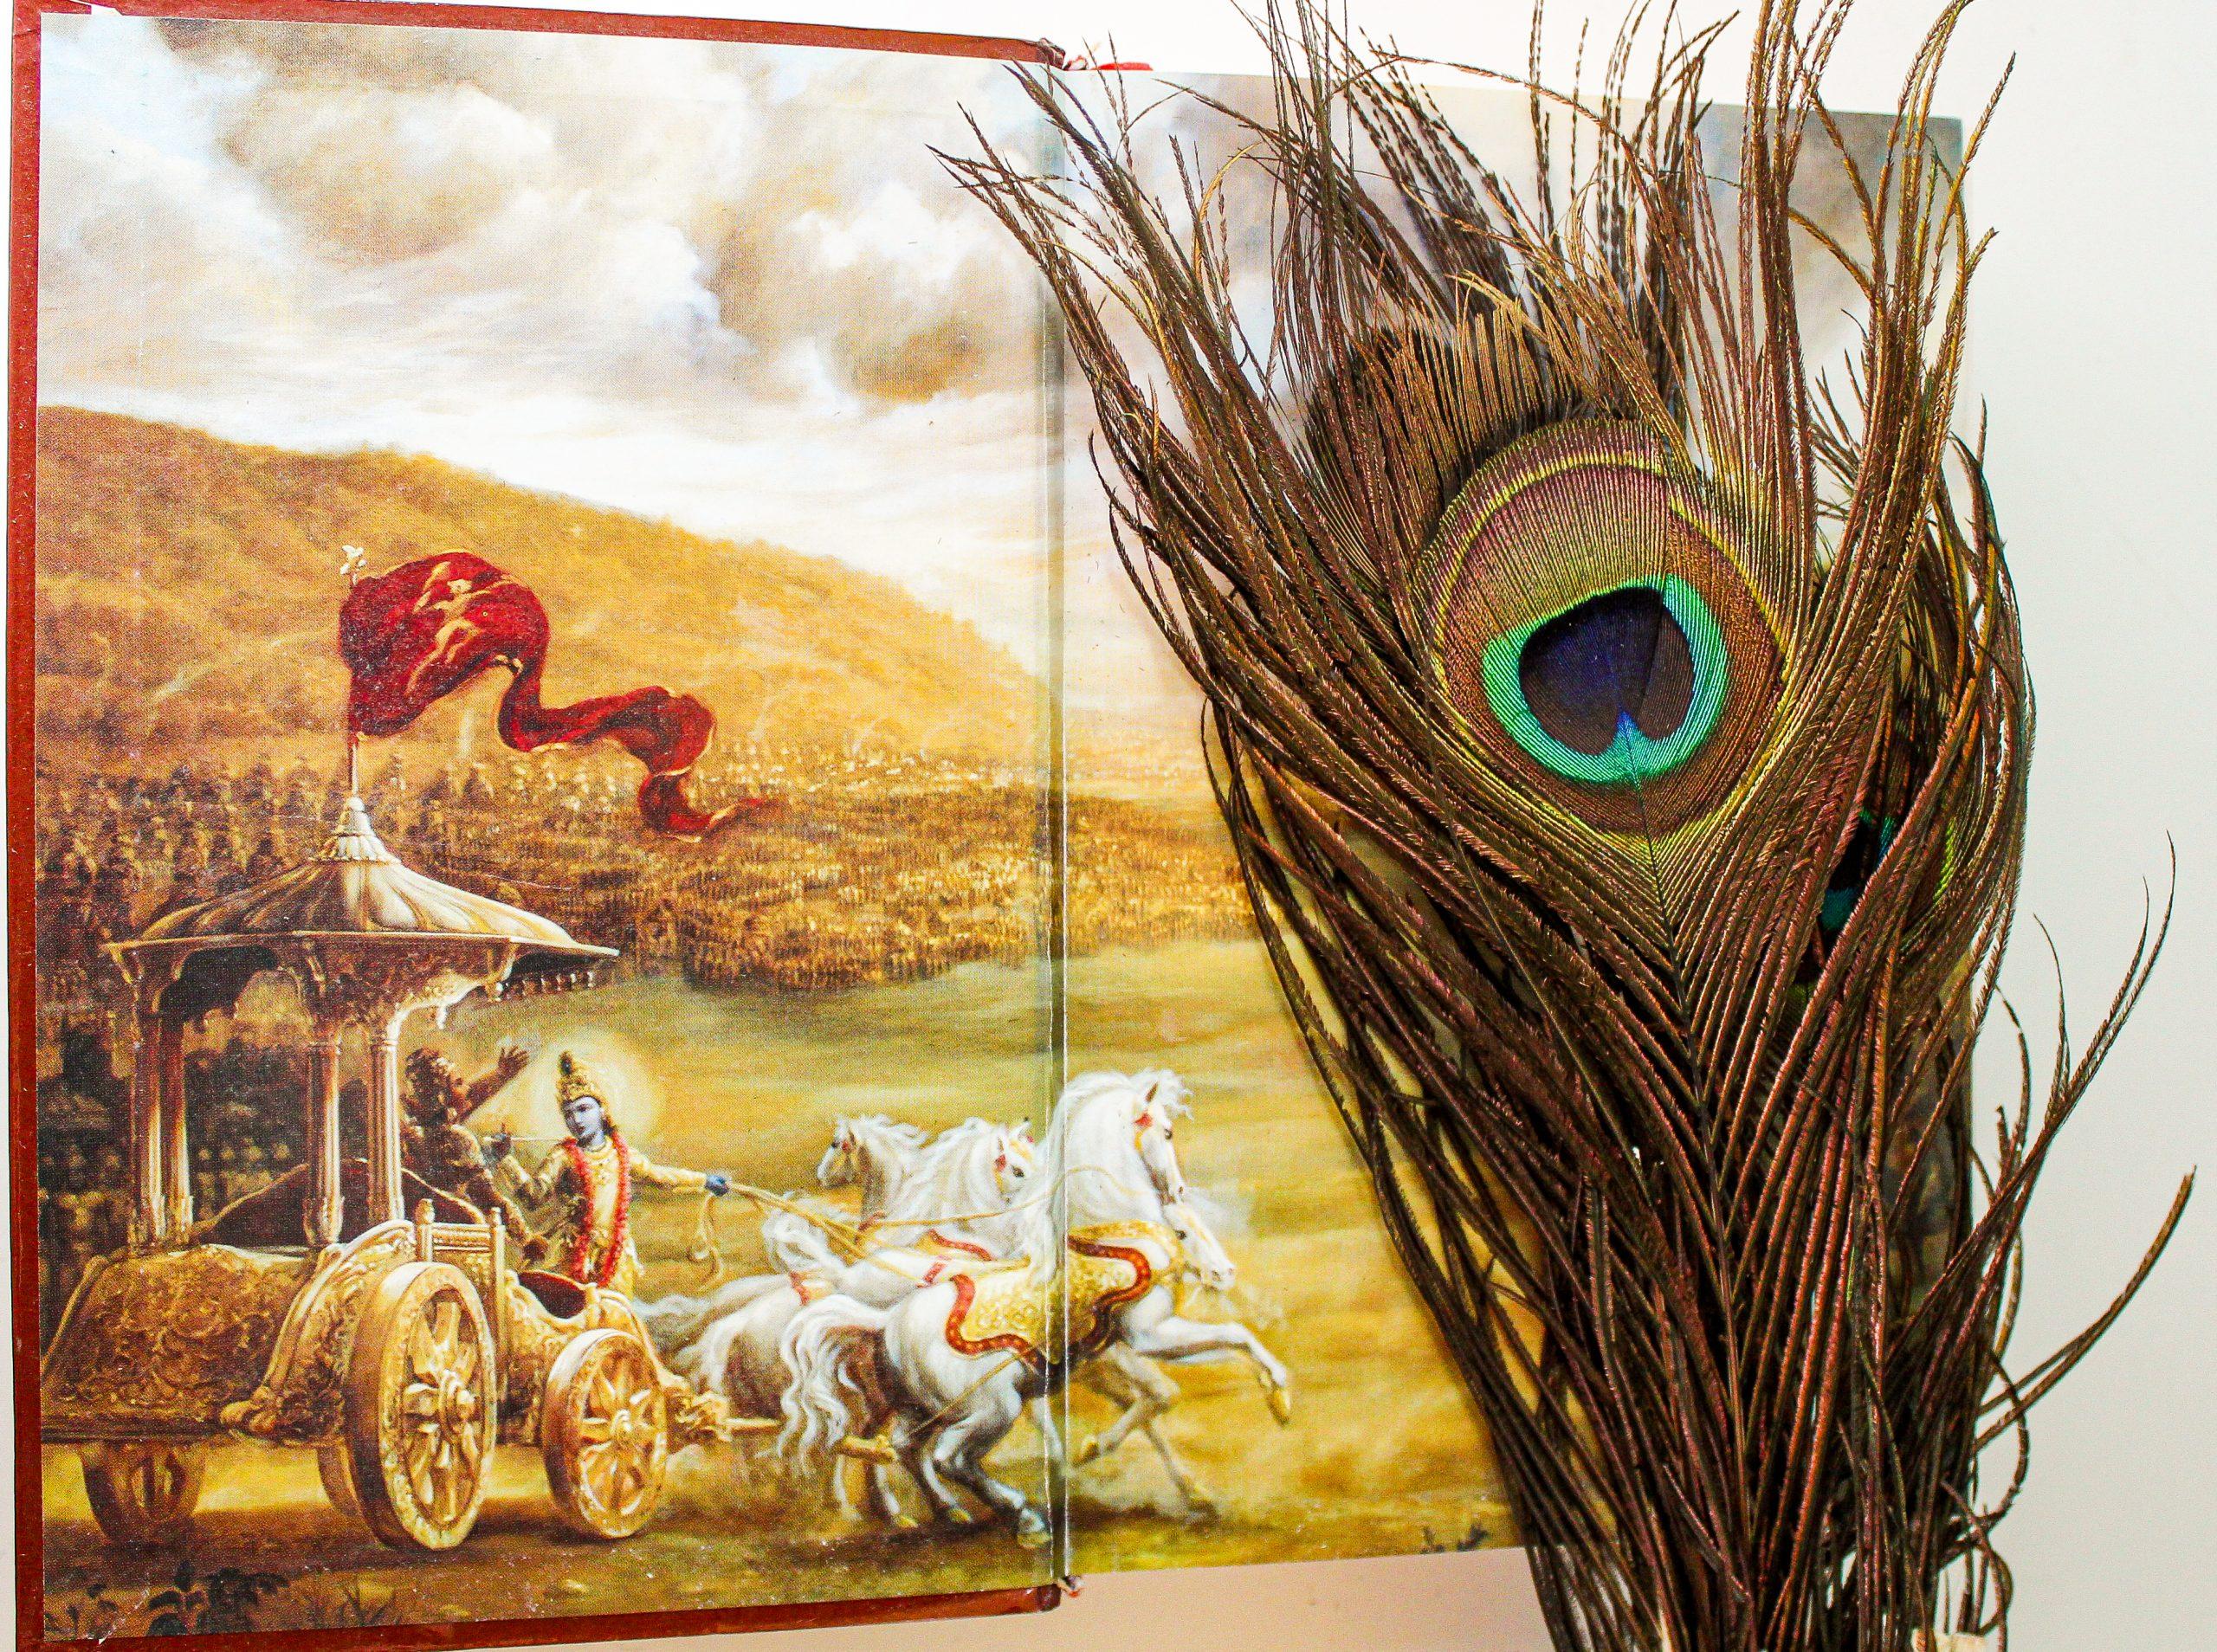 Bhagwat Geeta and feathers